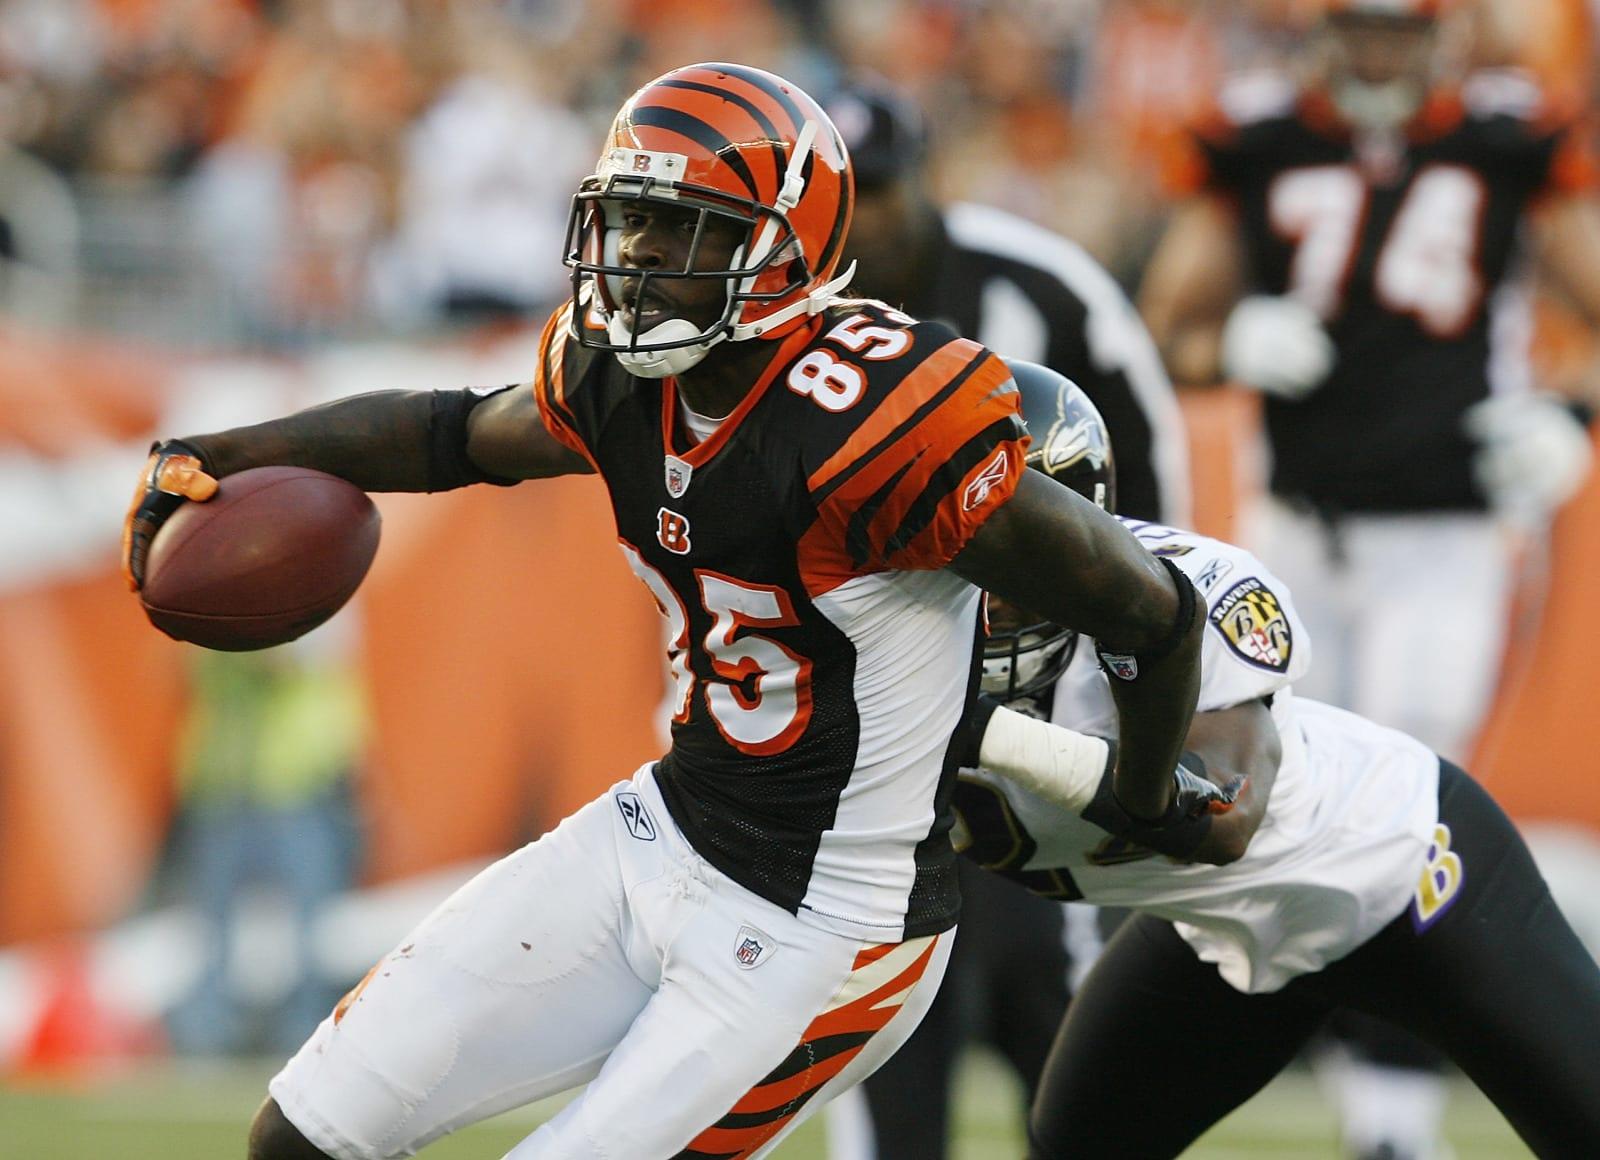 Chad 'Ochocinco' Johnson, Cincinnati Bengals